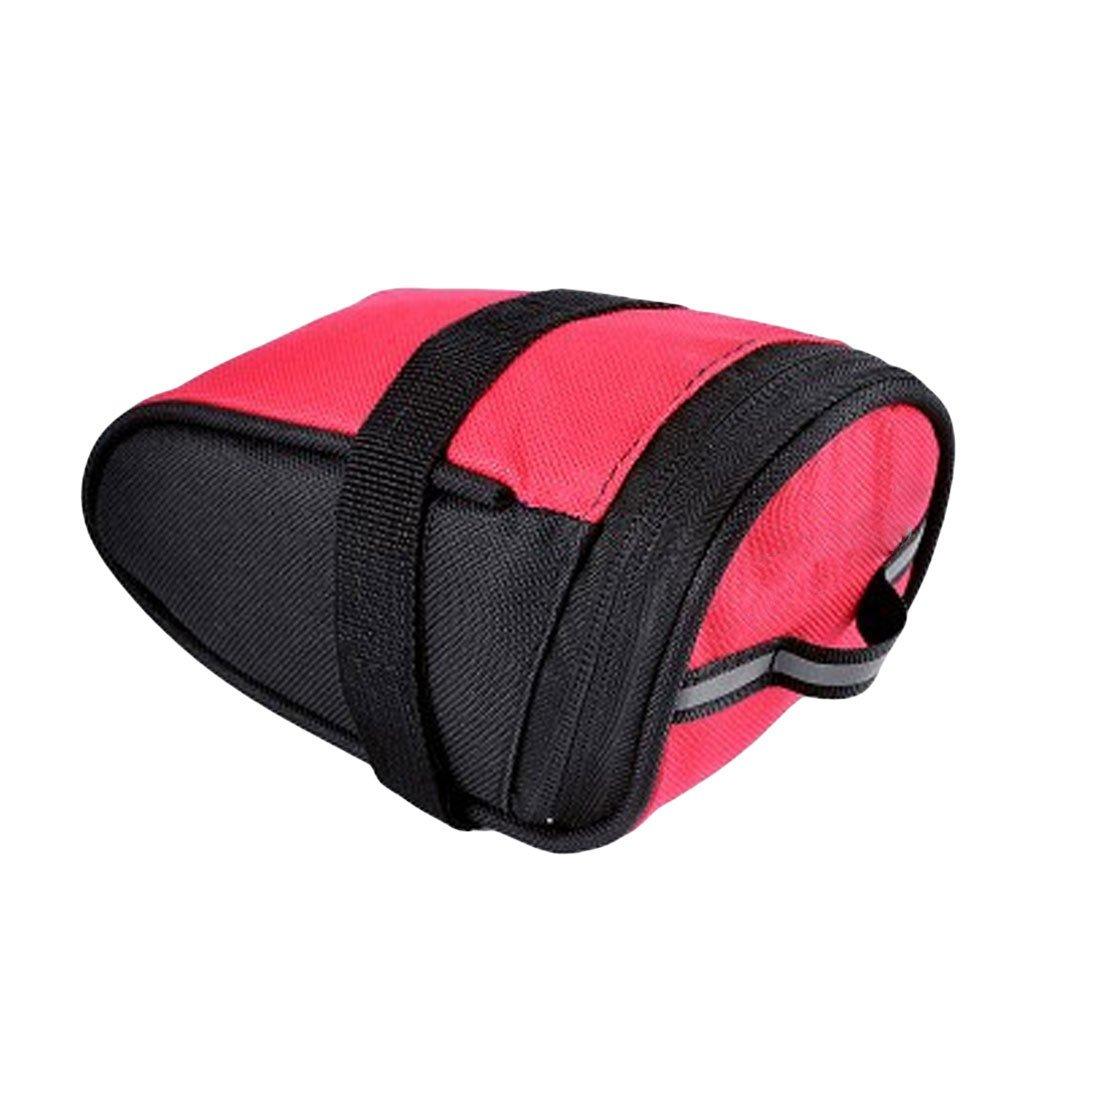 1ps Waterproof Bike Saddle Bag Back Seat Luwu-Store